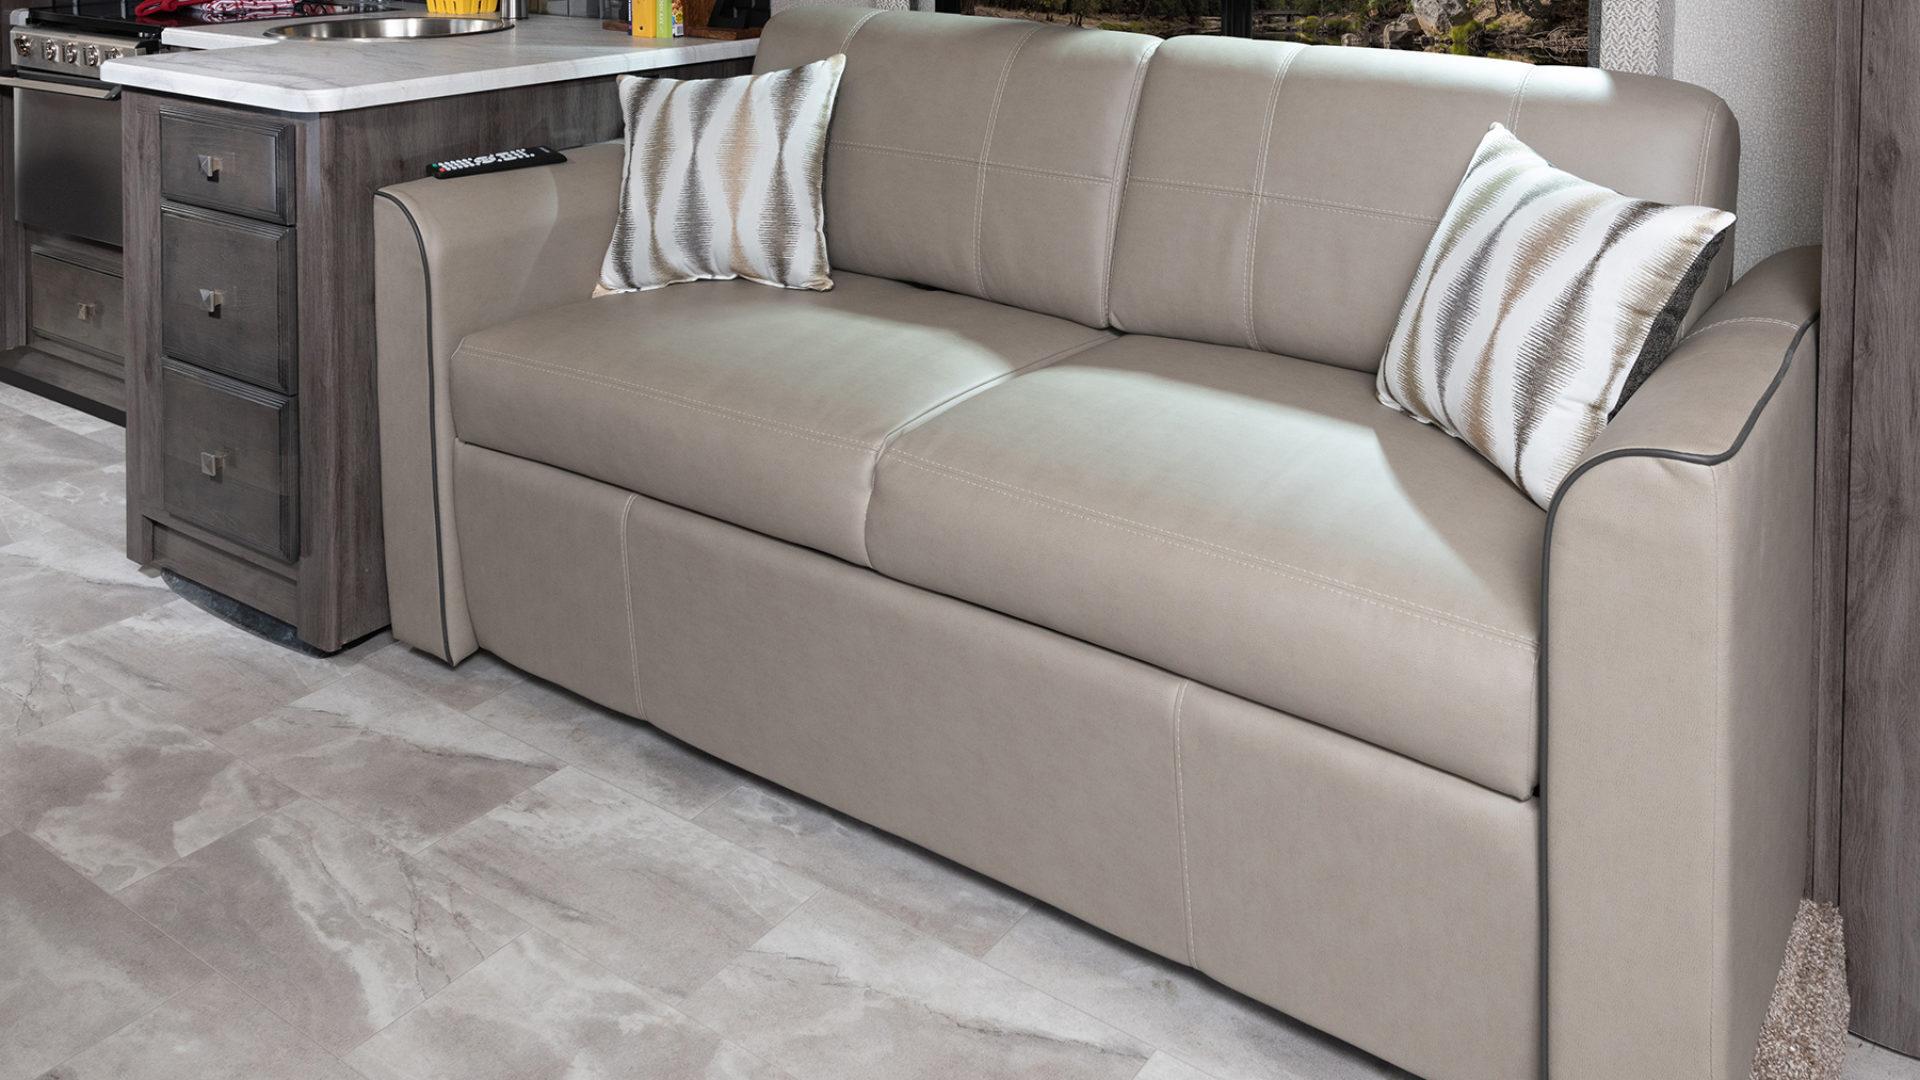 6 sofa Admiral29 M moonscapewhispwind 0573close MY21